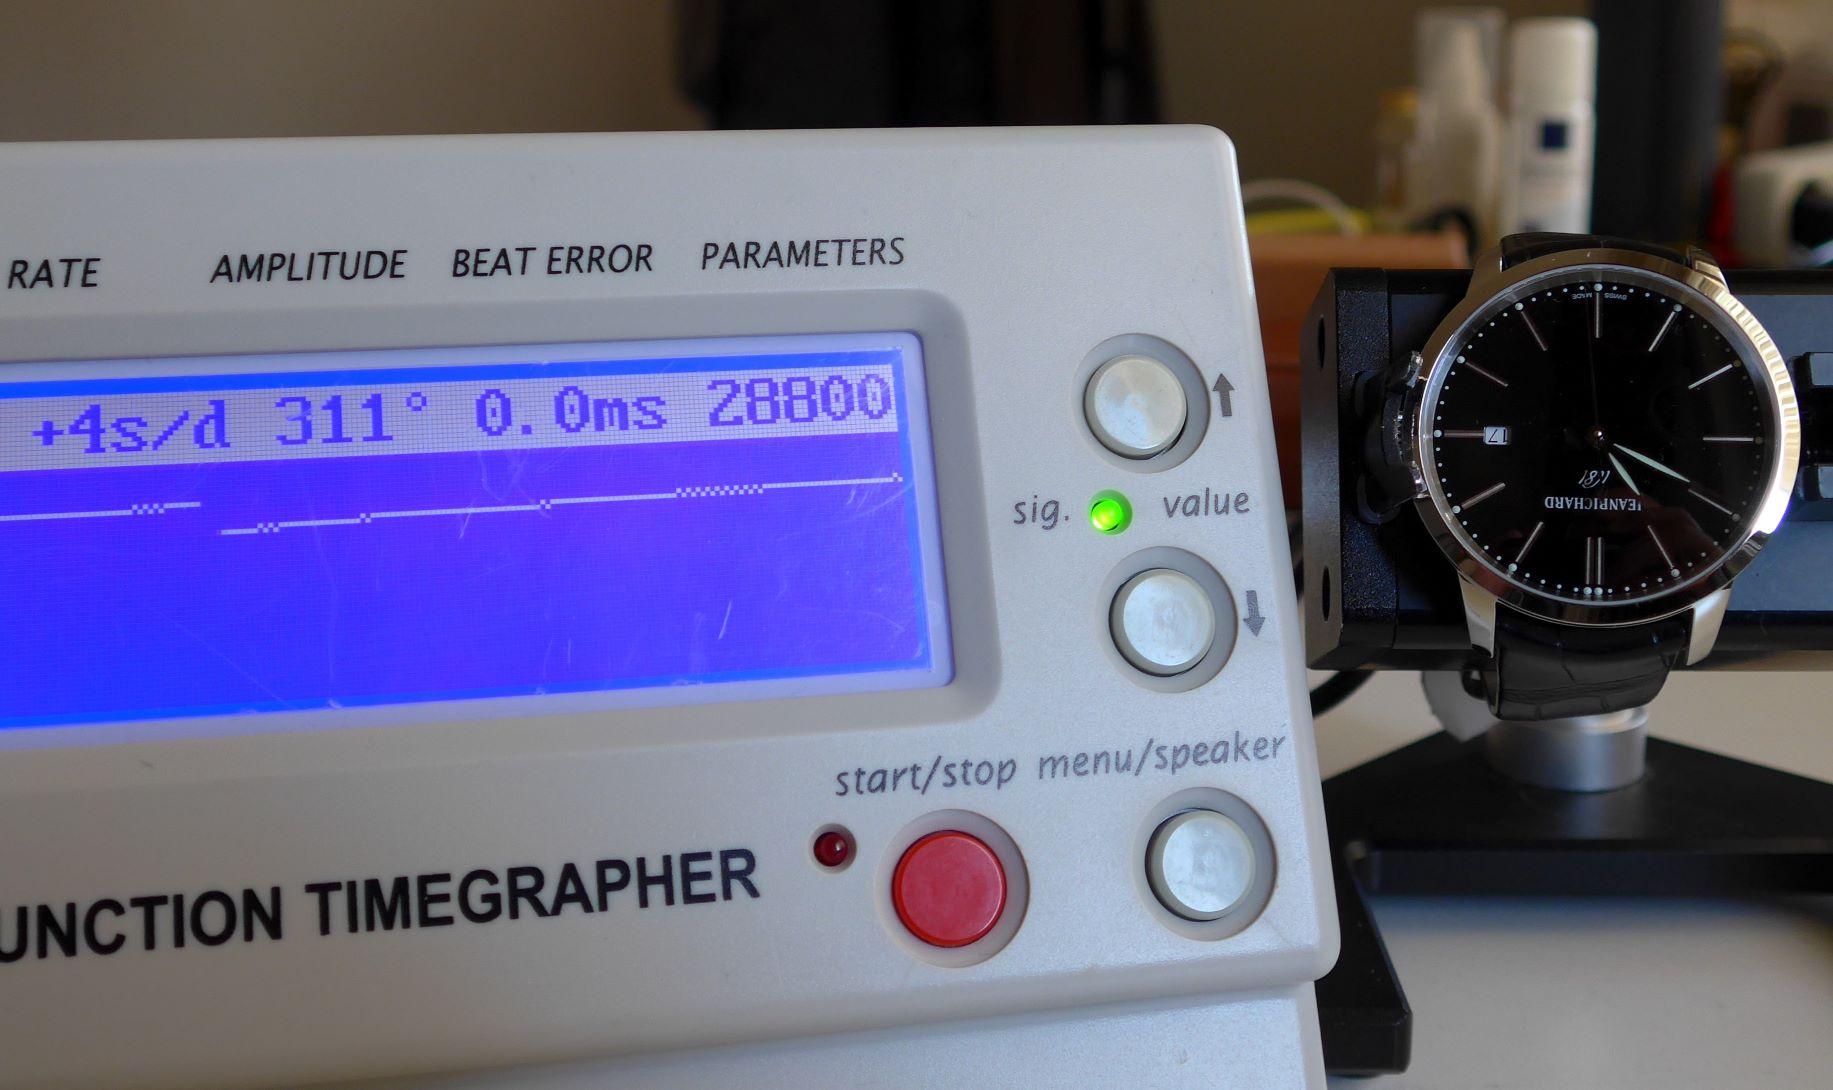 P1030202 (2).JPG